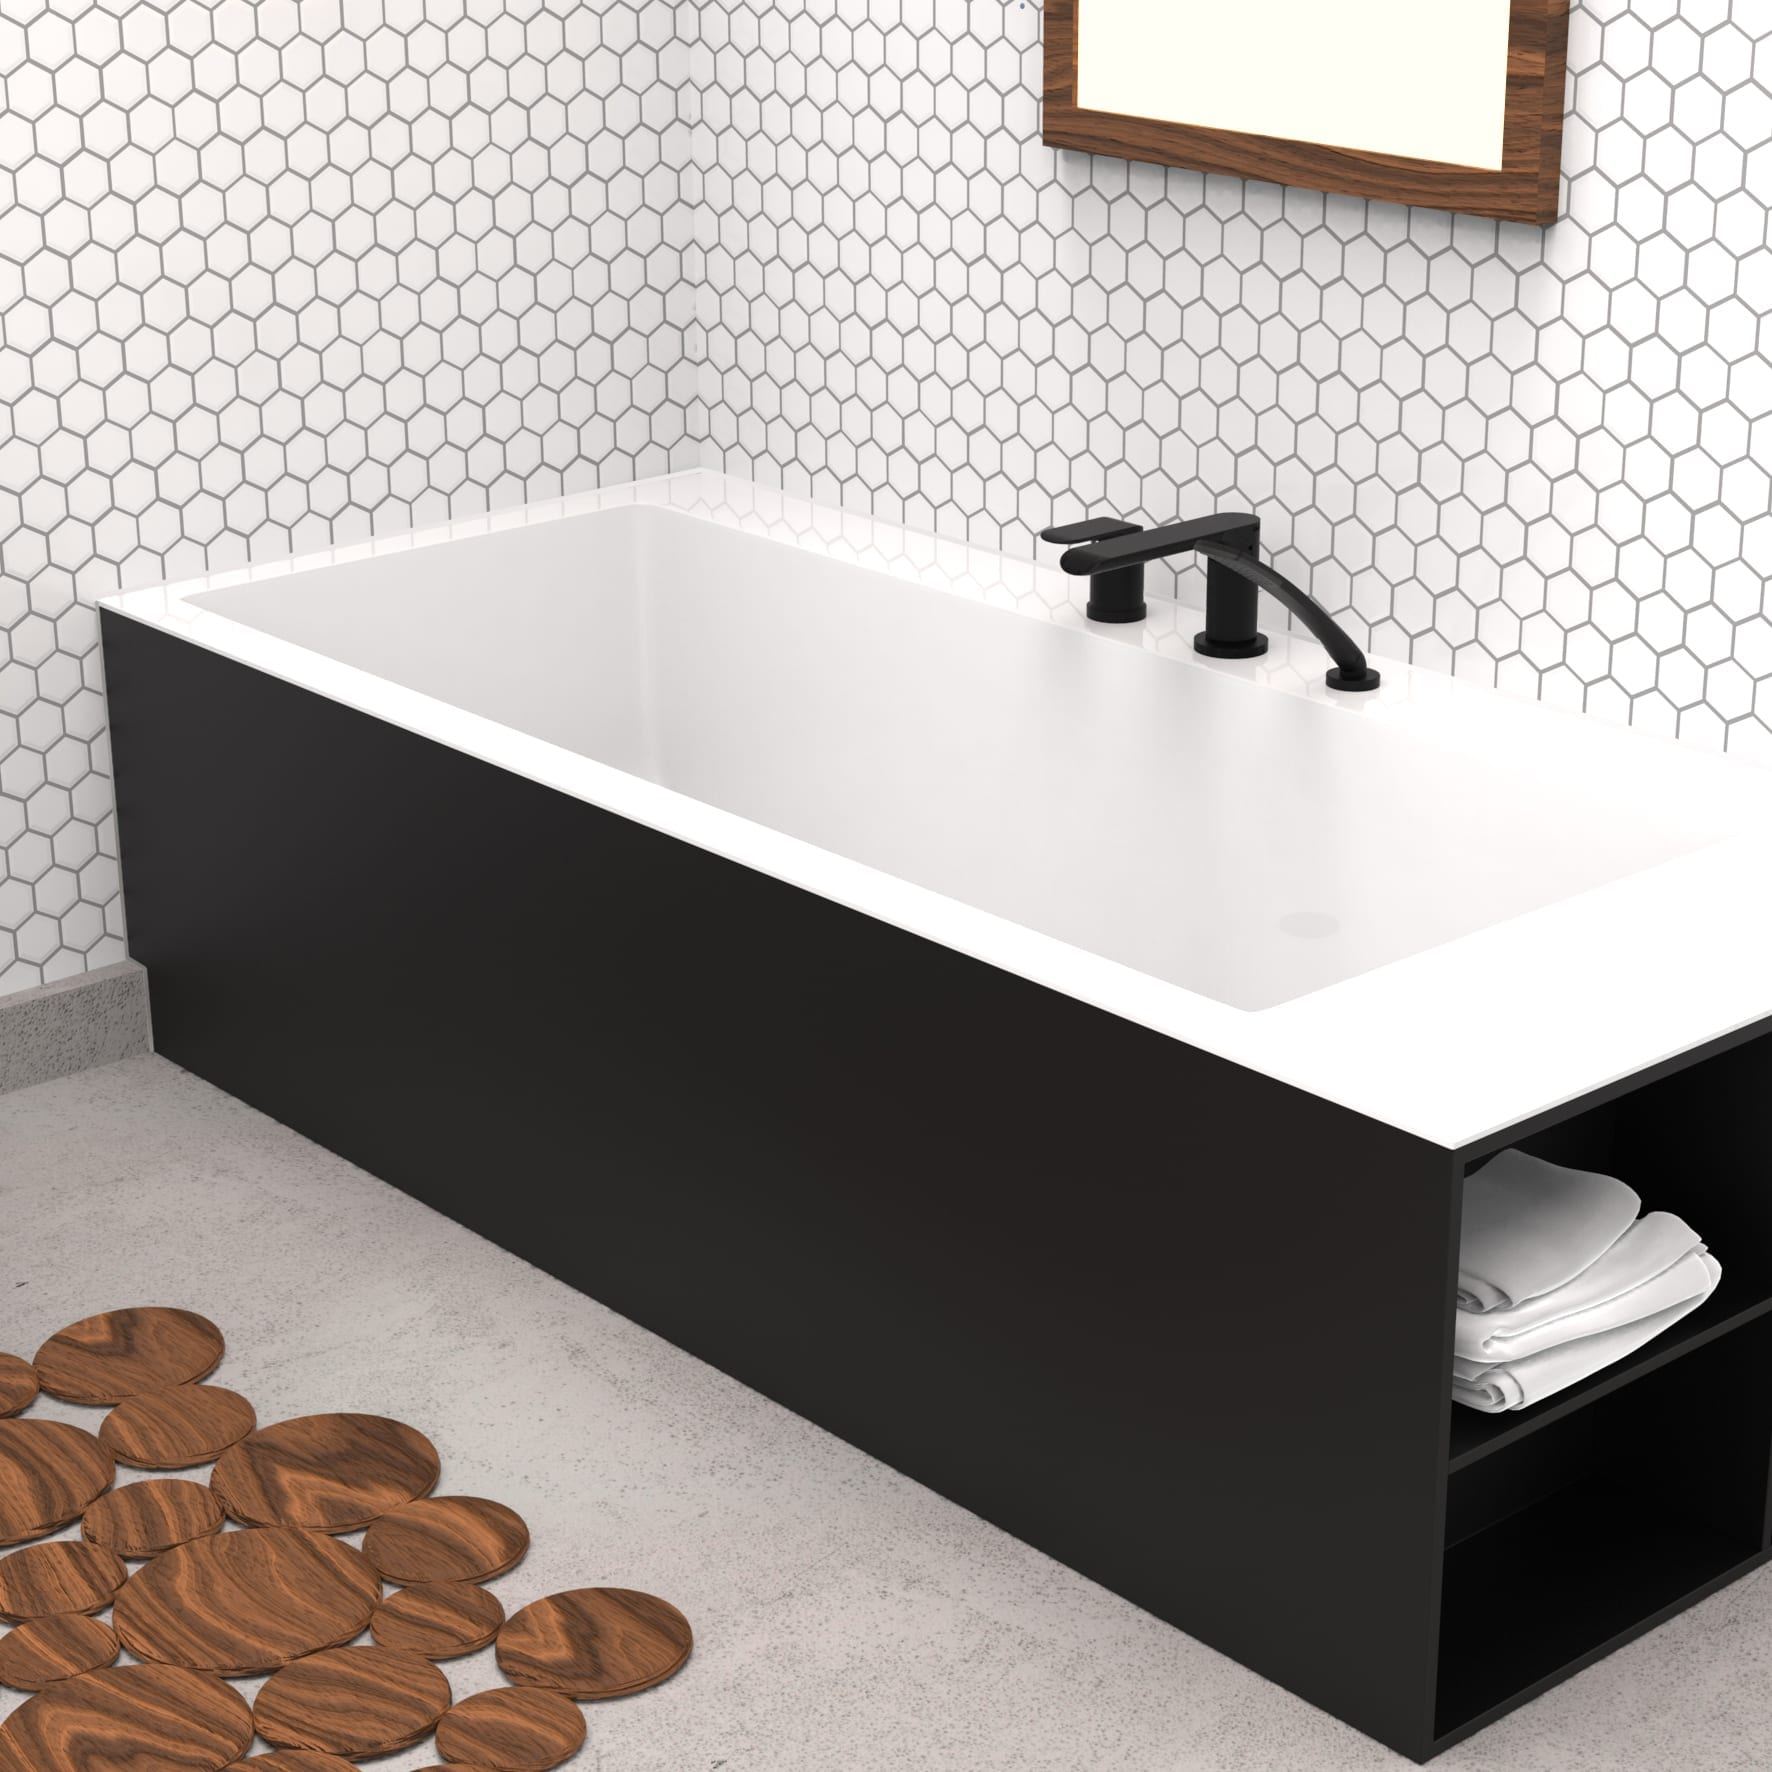 Matte Black Bathtub Faucet - Trim for Roman Bathtub, Hand Shower ...